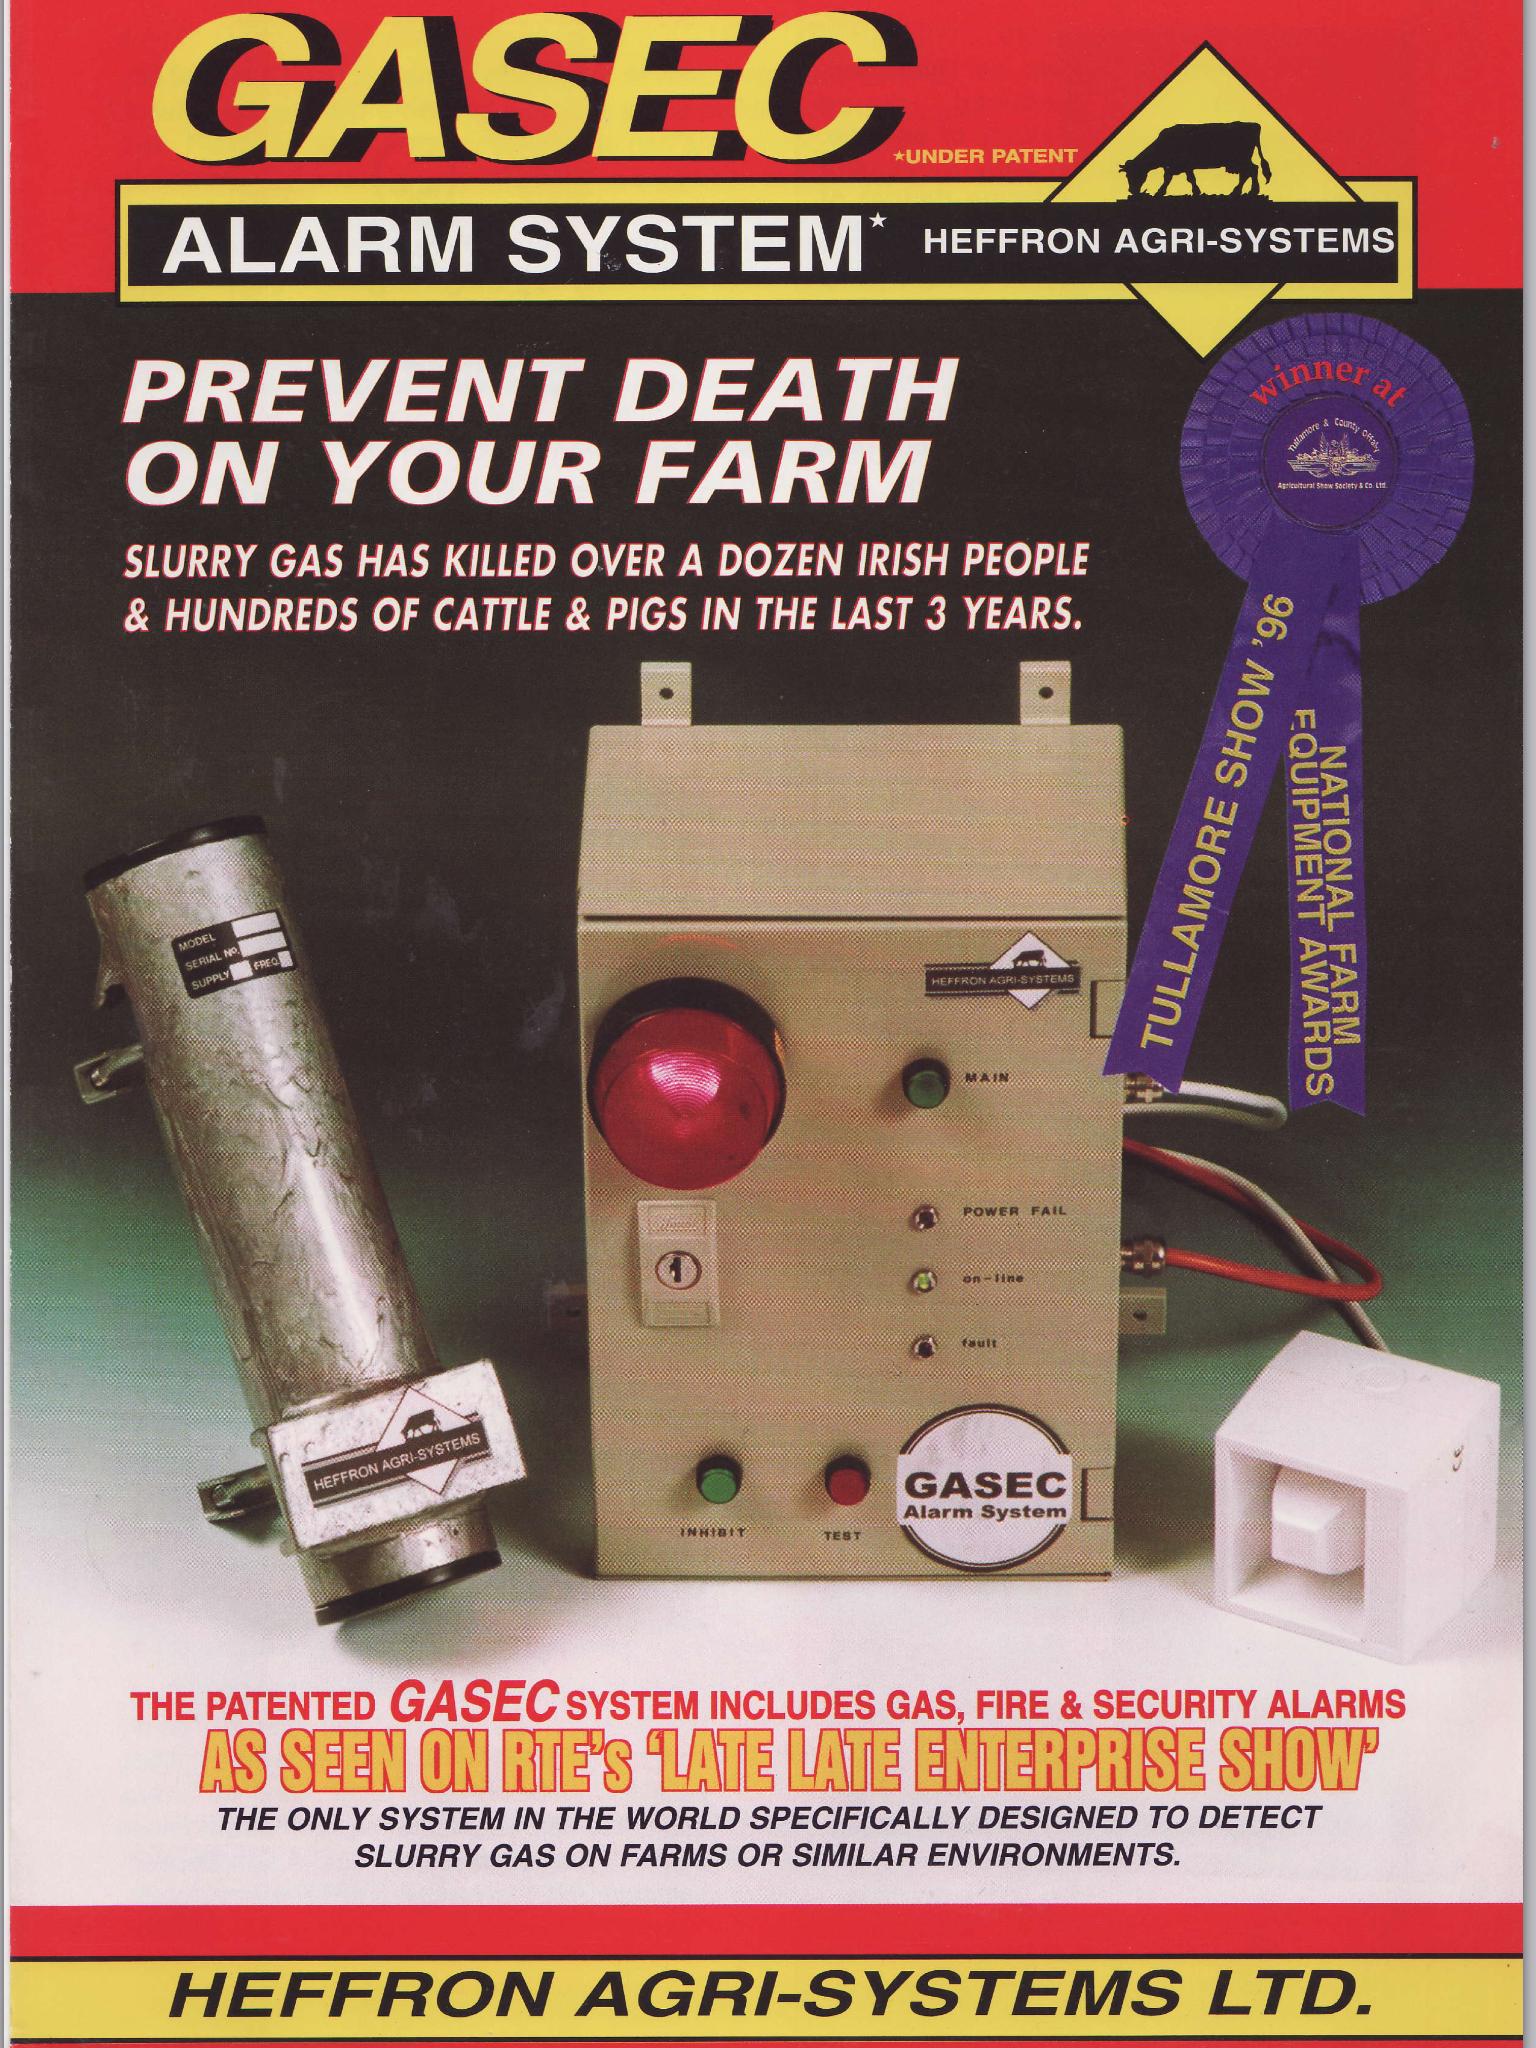 Award winning GASEC toxic gas alarm brochure for Farms